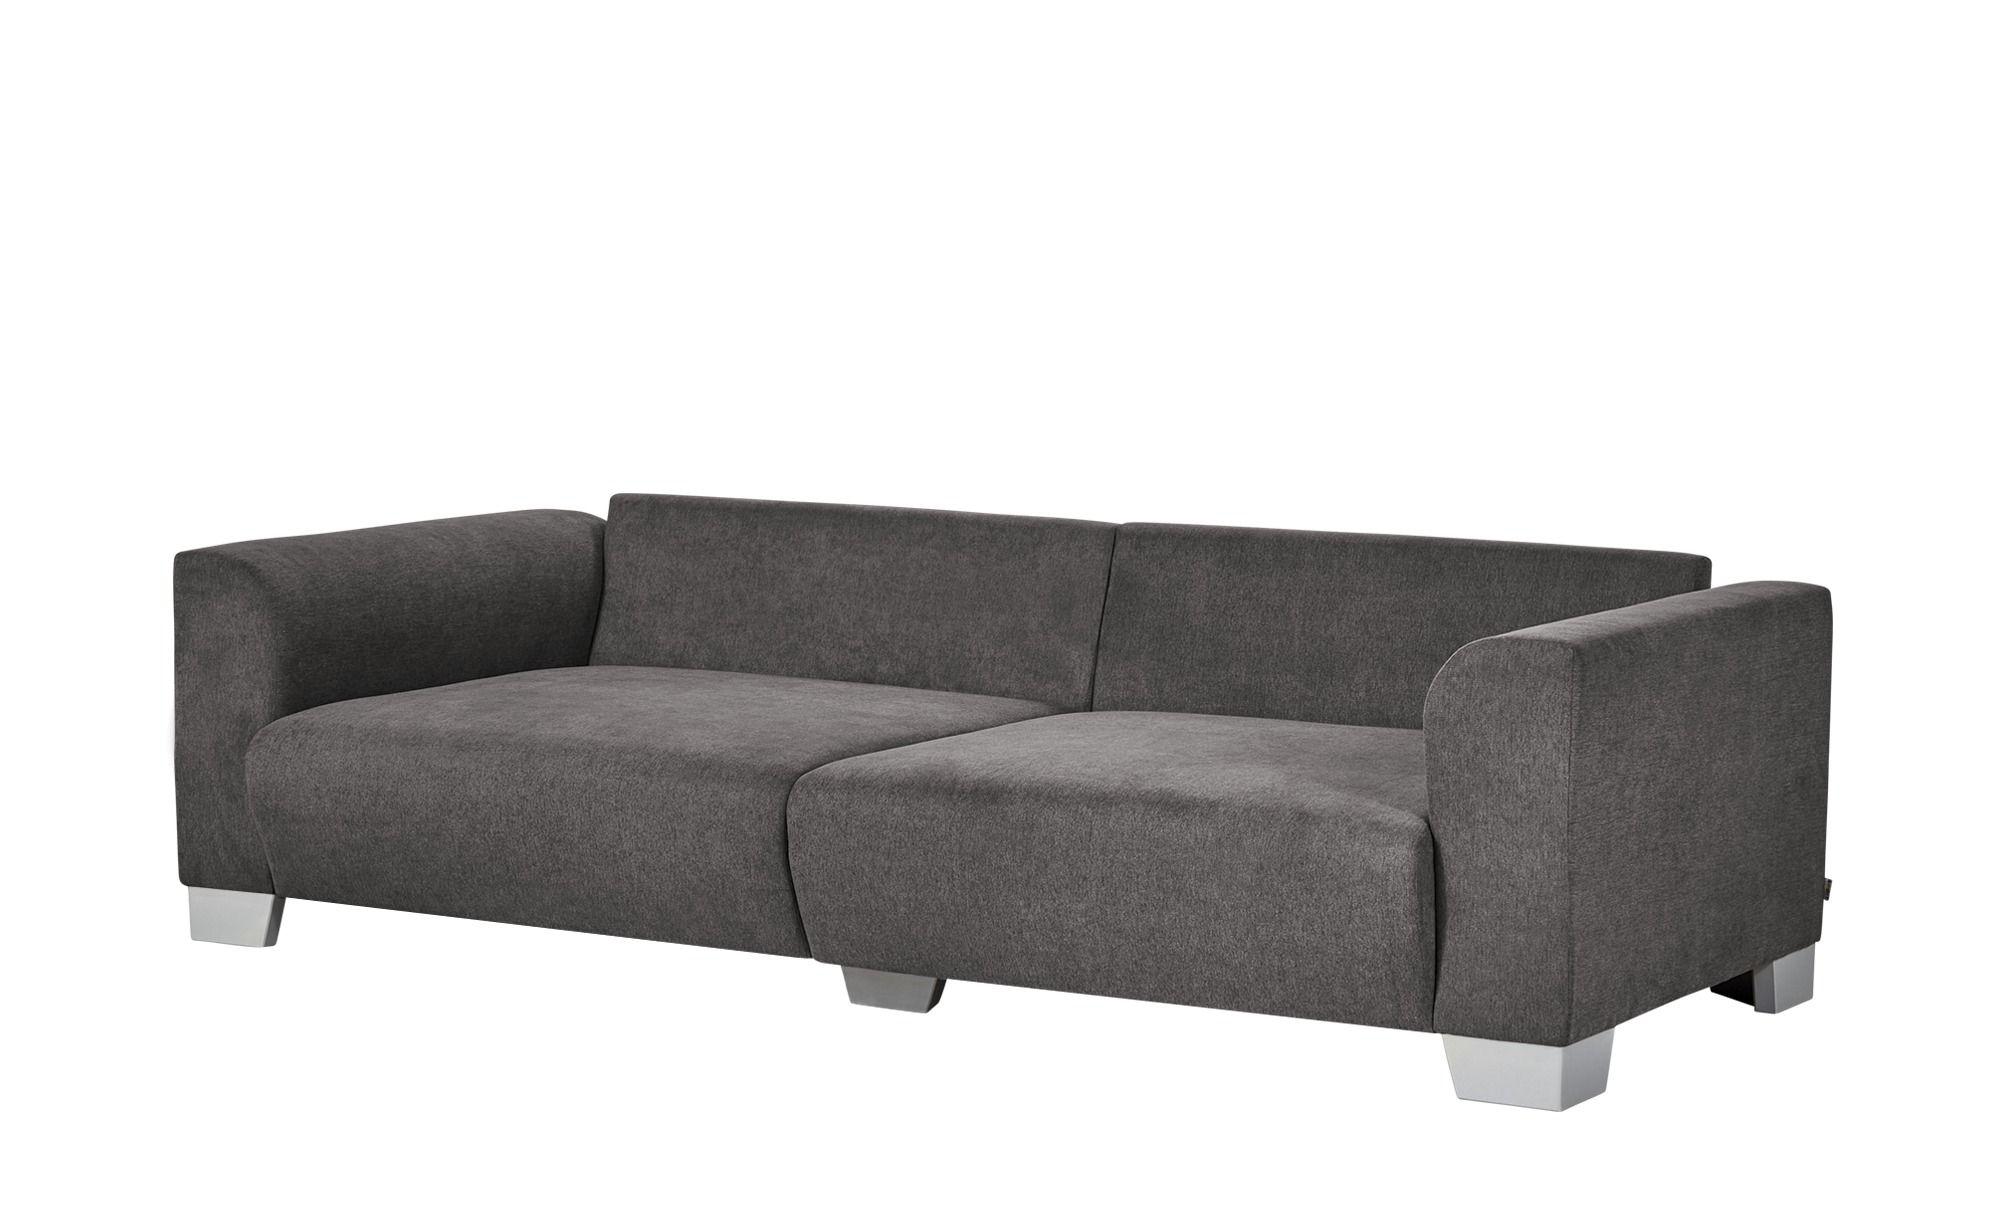 Smart Big Sofa Tonja Gefunden Bei Mobel Hoffner In 2020 Grosse Sofas Big Sofa Grau Und Sofa